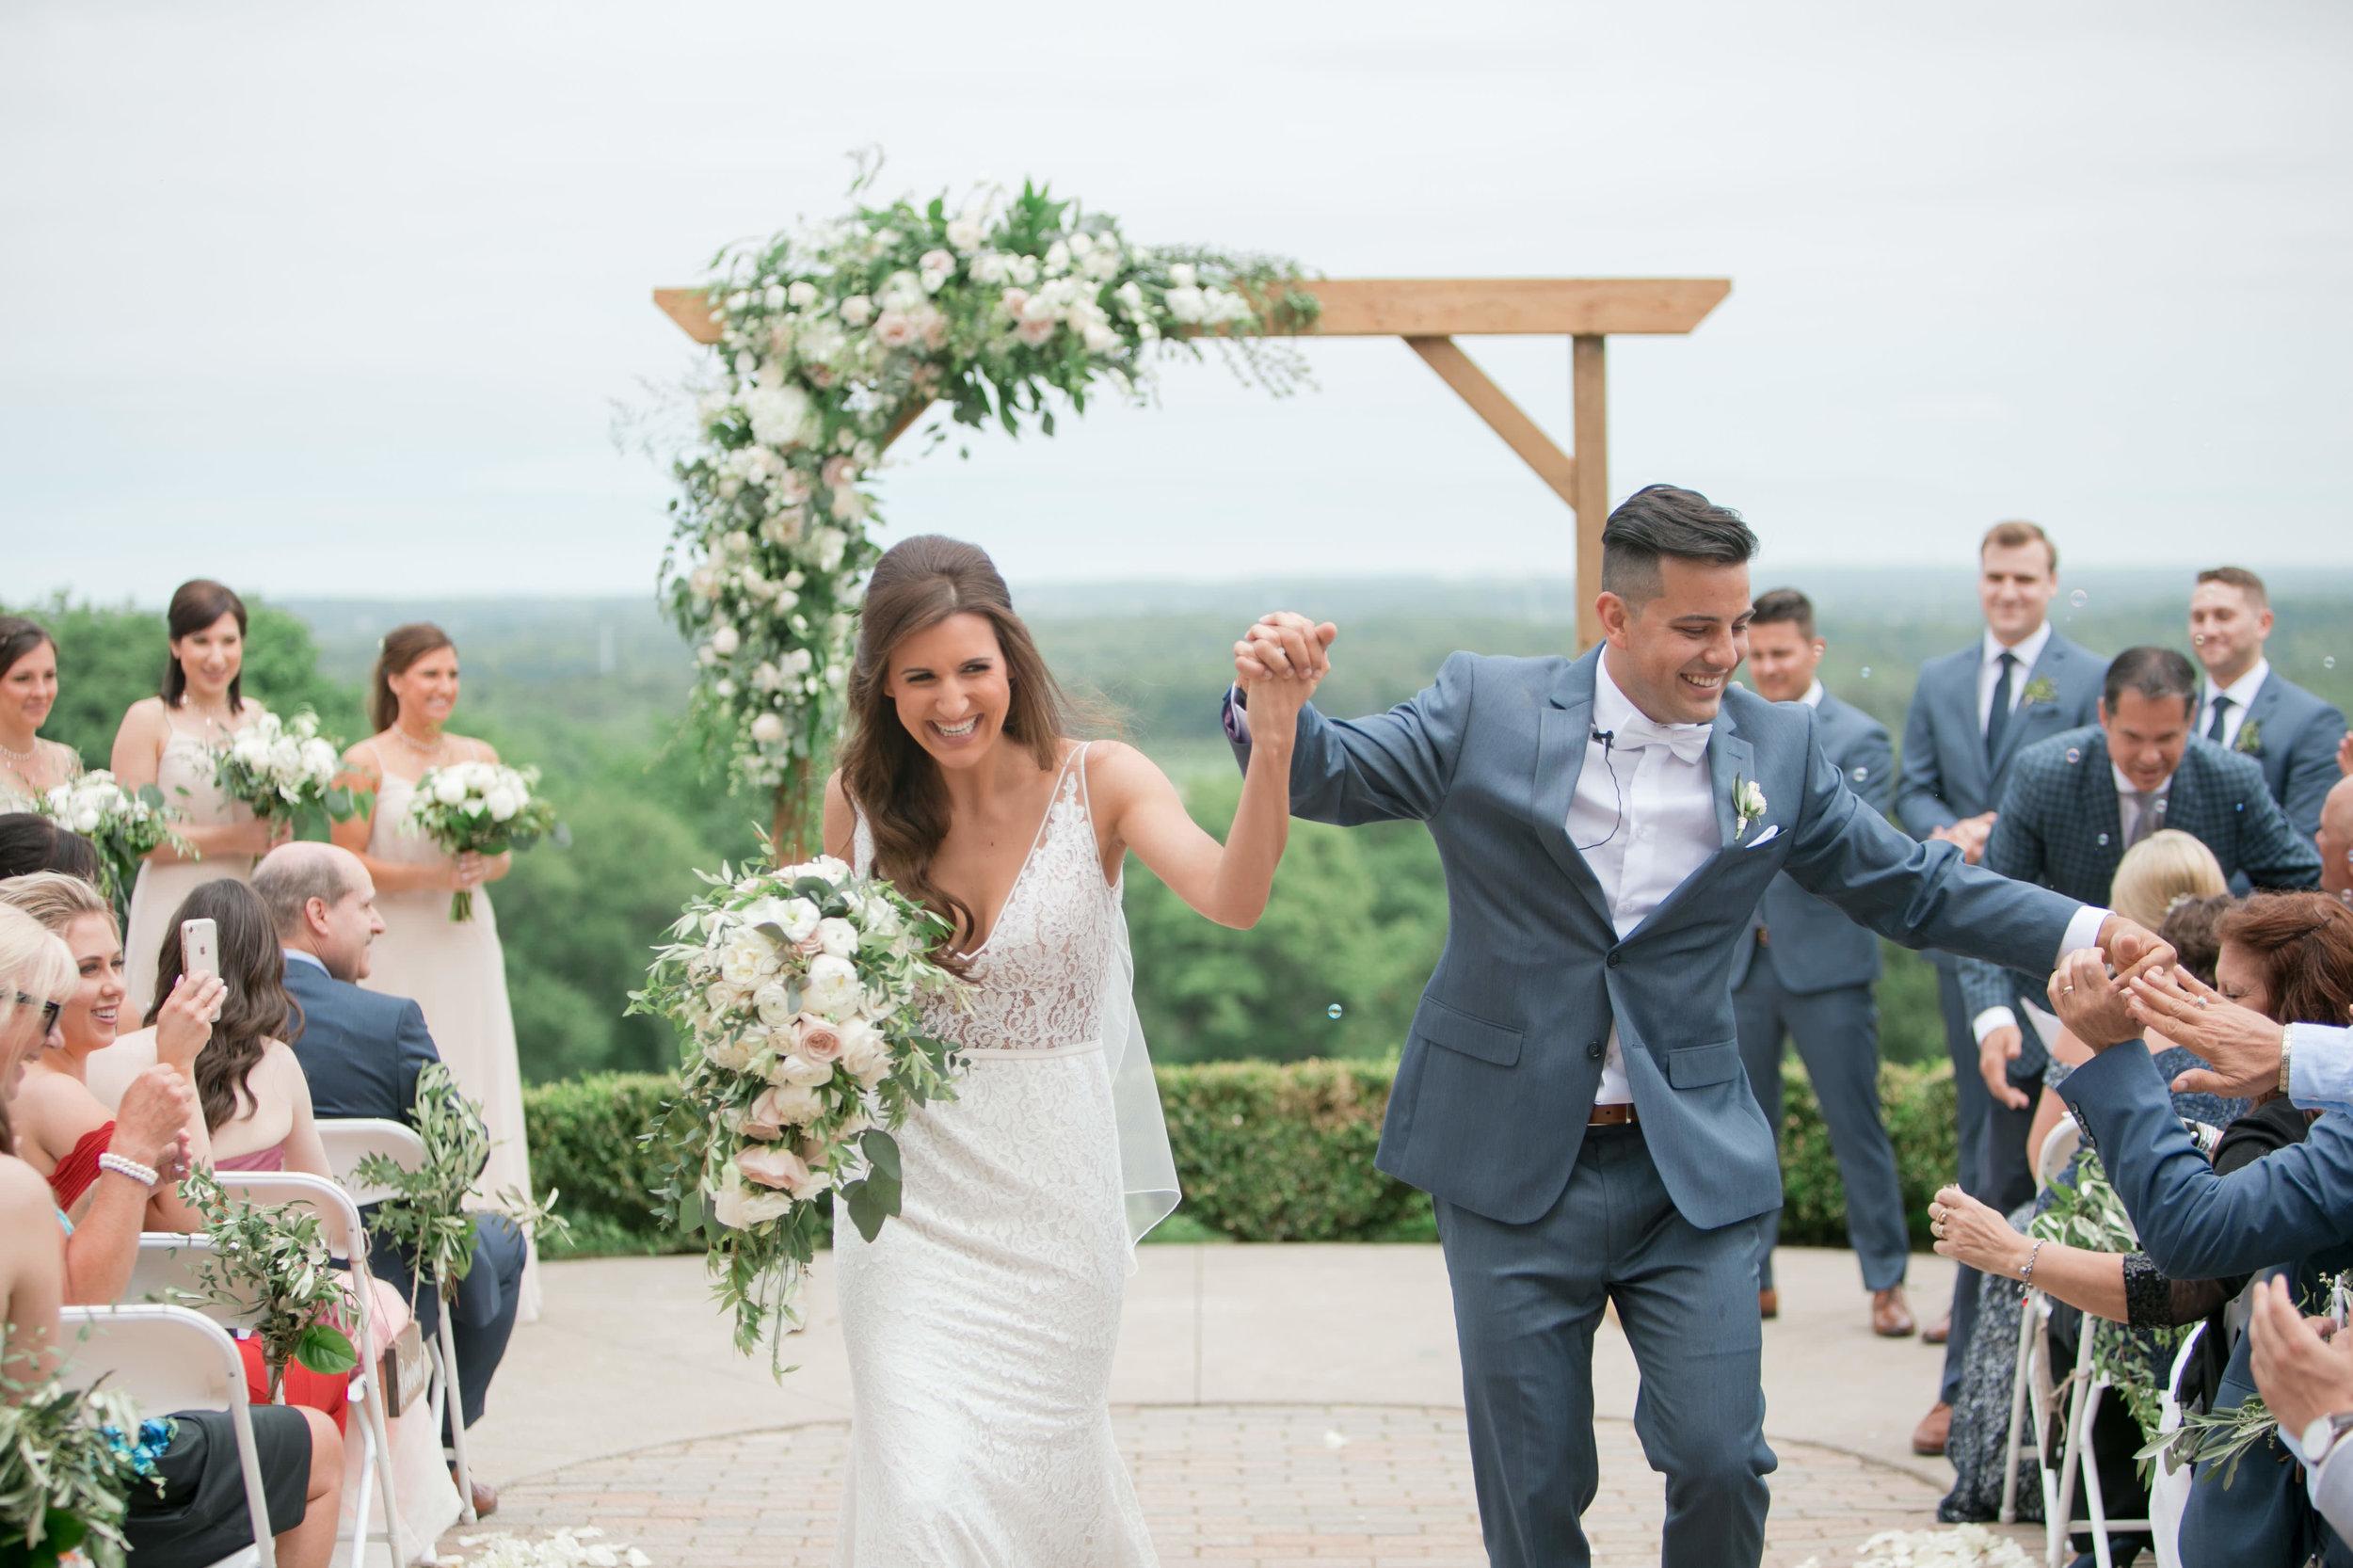 Miranda___Daniel___Daniel_Ricci_Weddings___High_Res._Finals_335.jpg